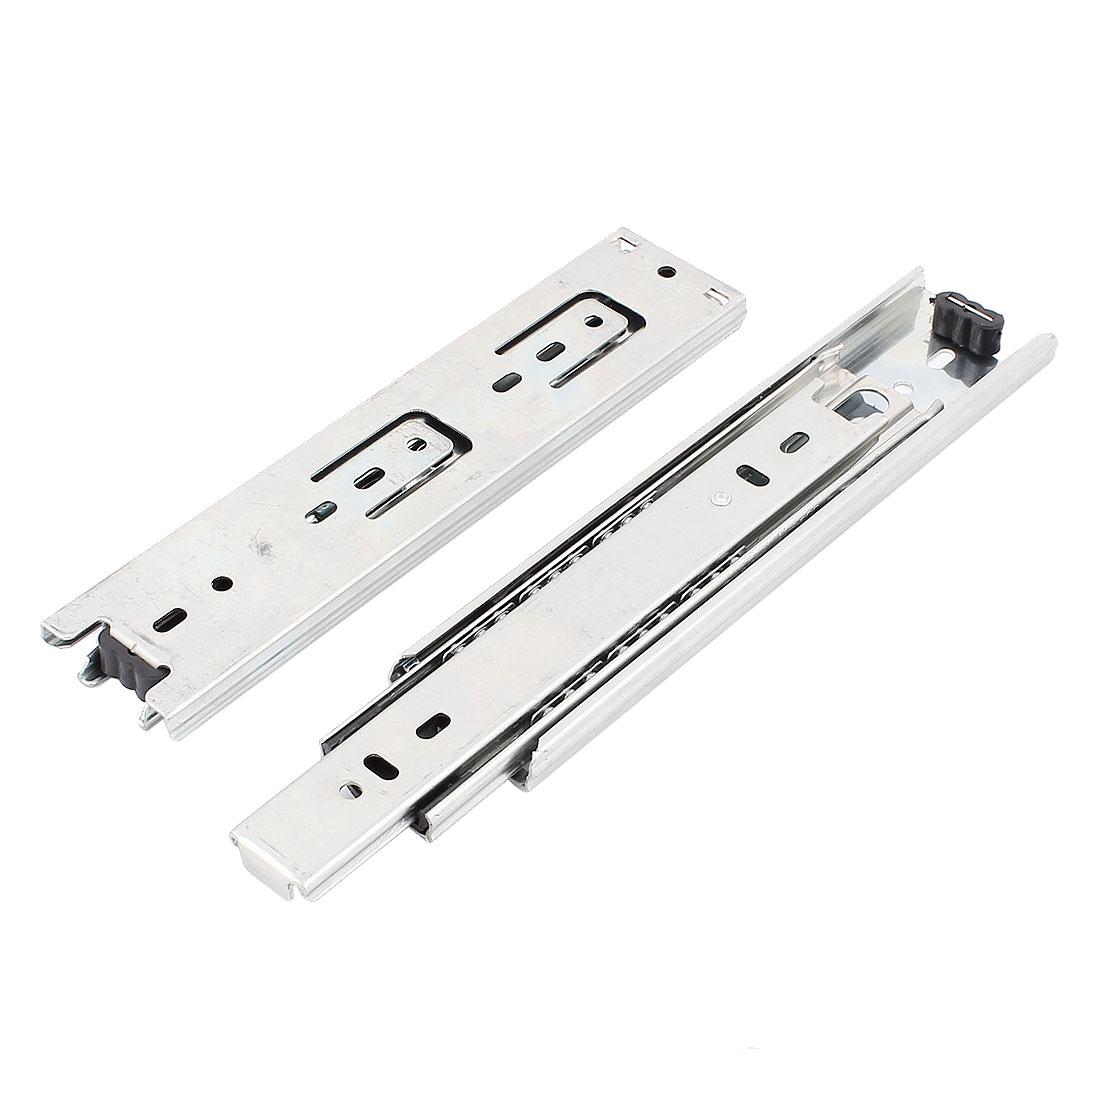 200mm Long Ball Bearing Drawer Slide Rail Track Silver Tone 2Pcs